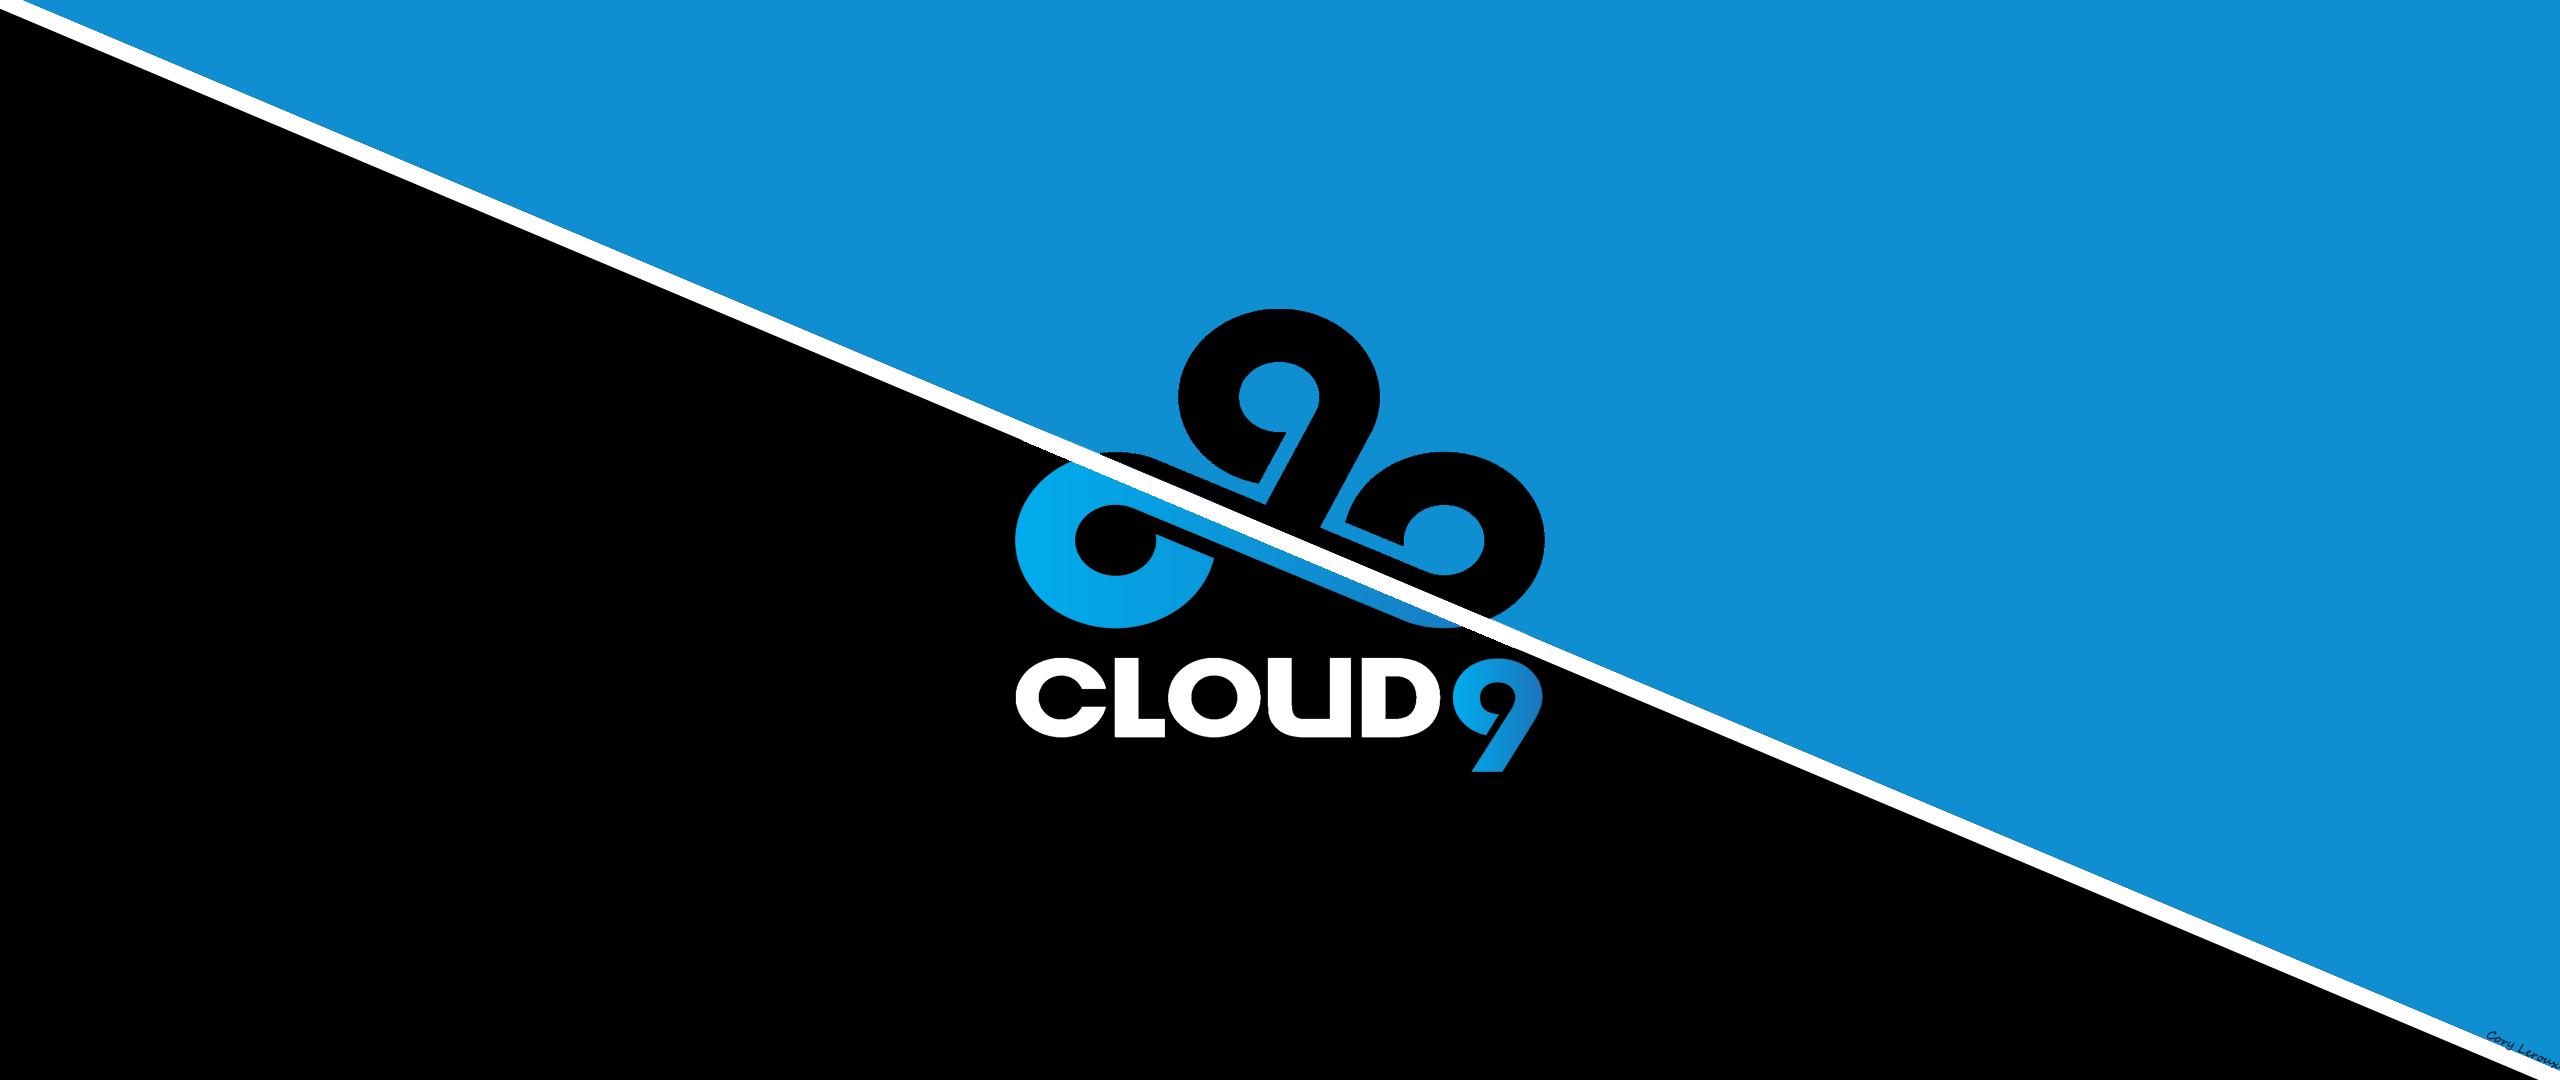 Cloud9 Wallpaper Hd Wallpaper Background Image 2560x1080 Id